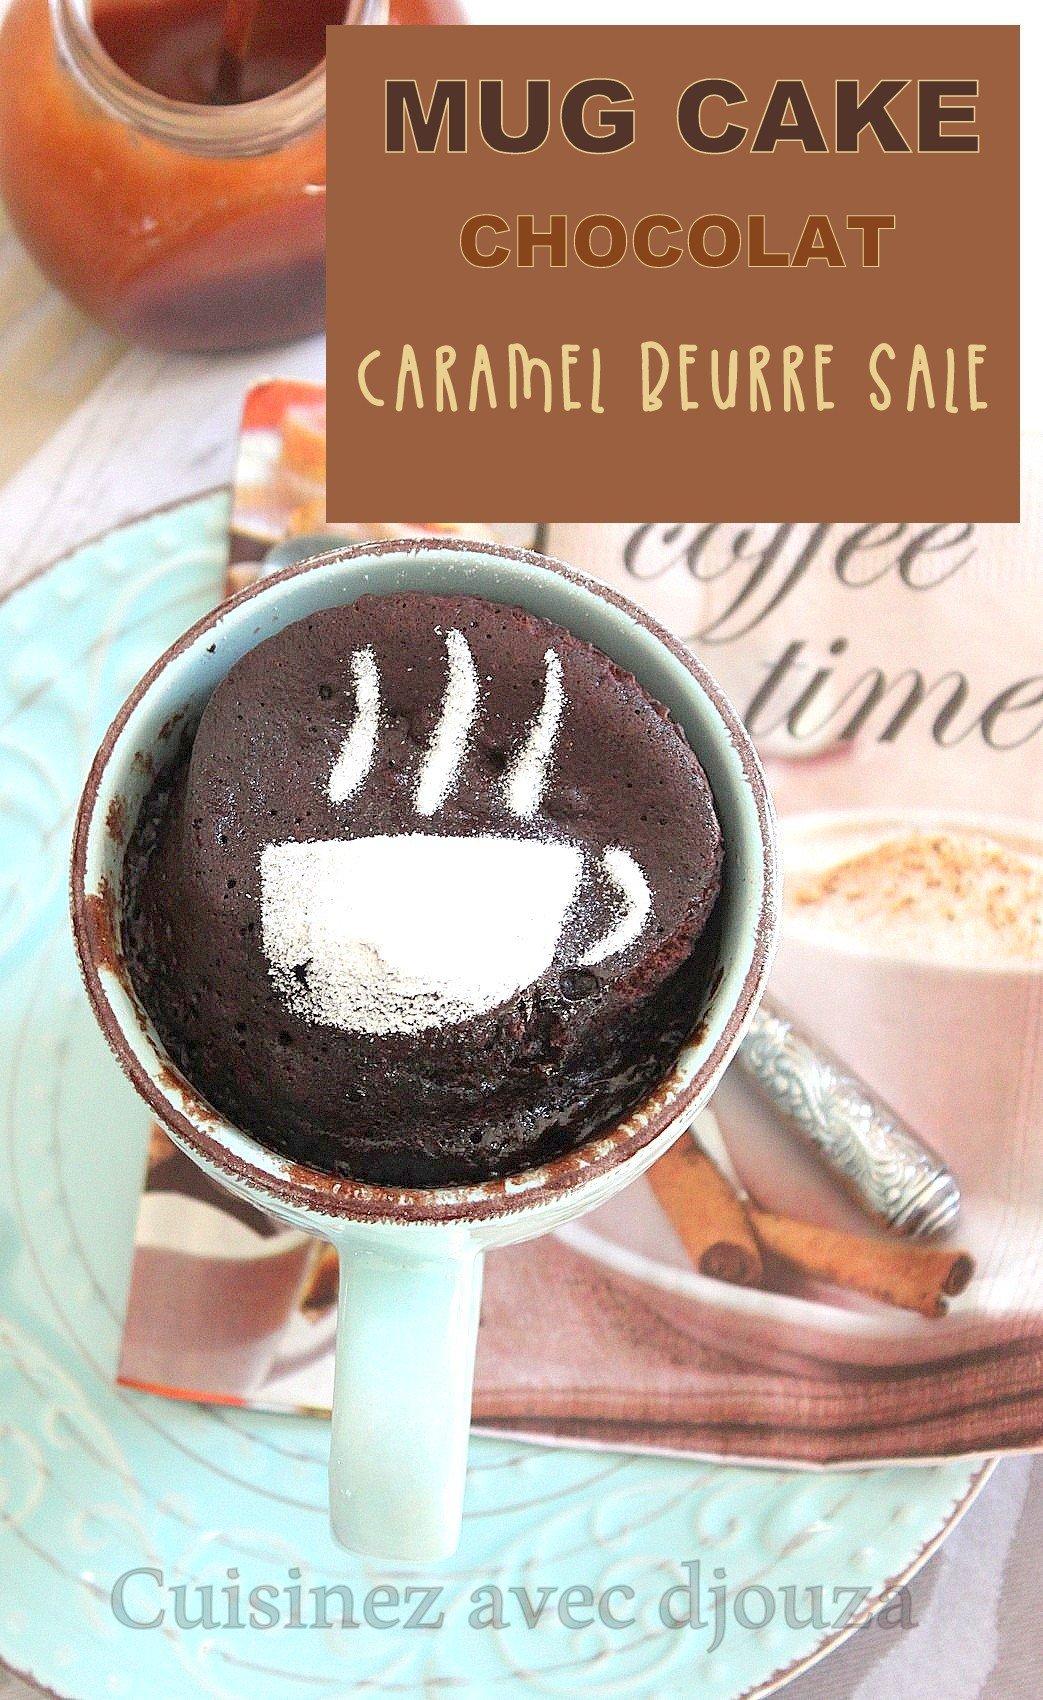 Recette mug cake au chocolat et caramel beurre salé, le gateau minute